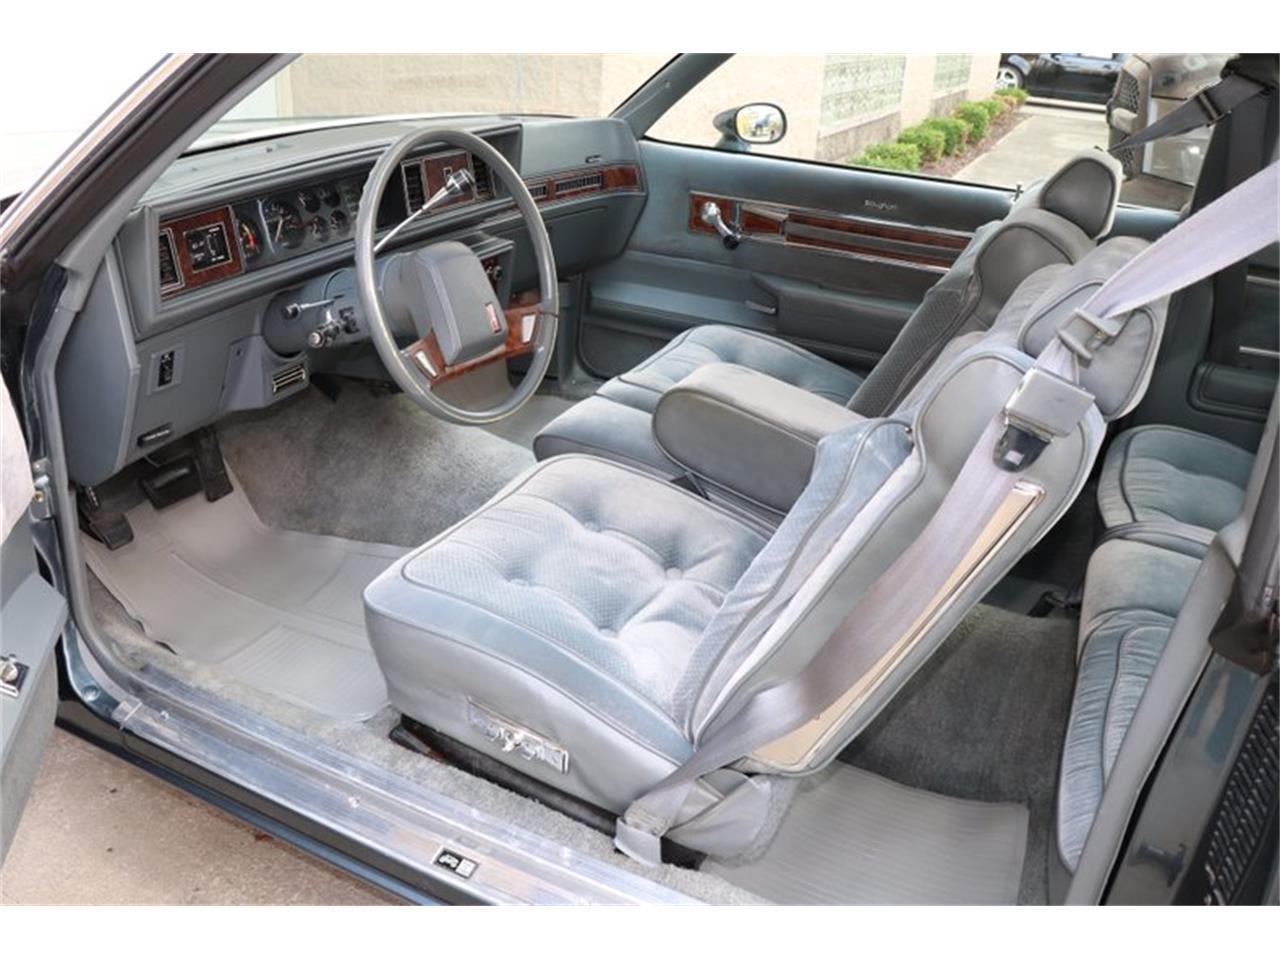 For Sale: 1985 Oldsmobile Cutlass in Alsip, Illinois